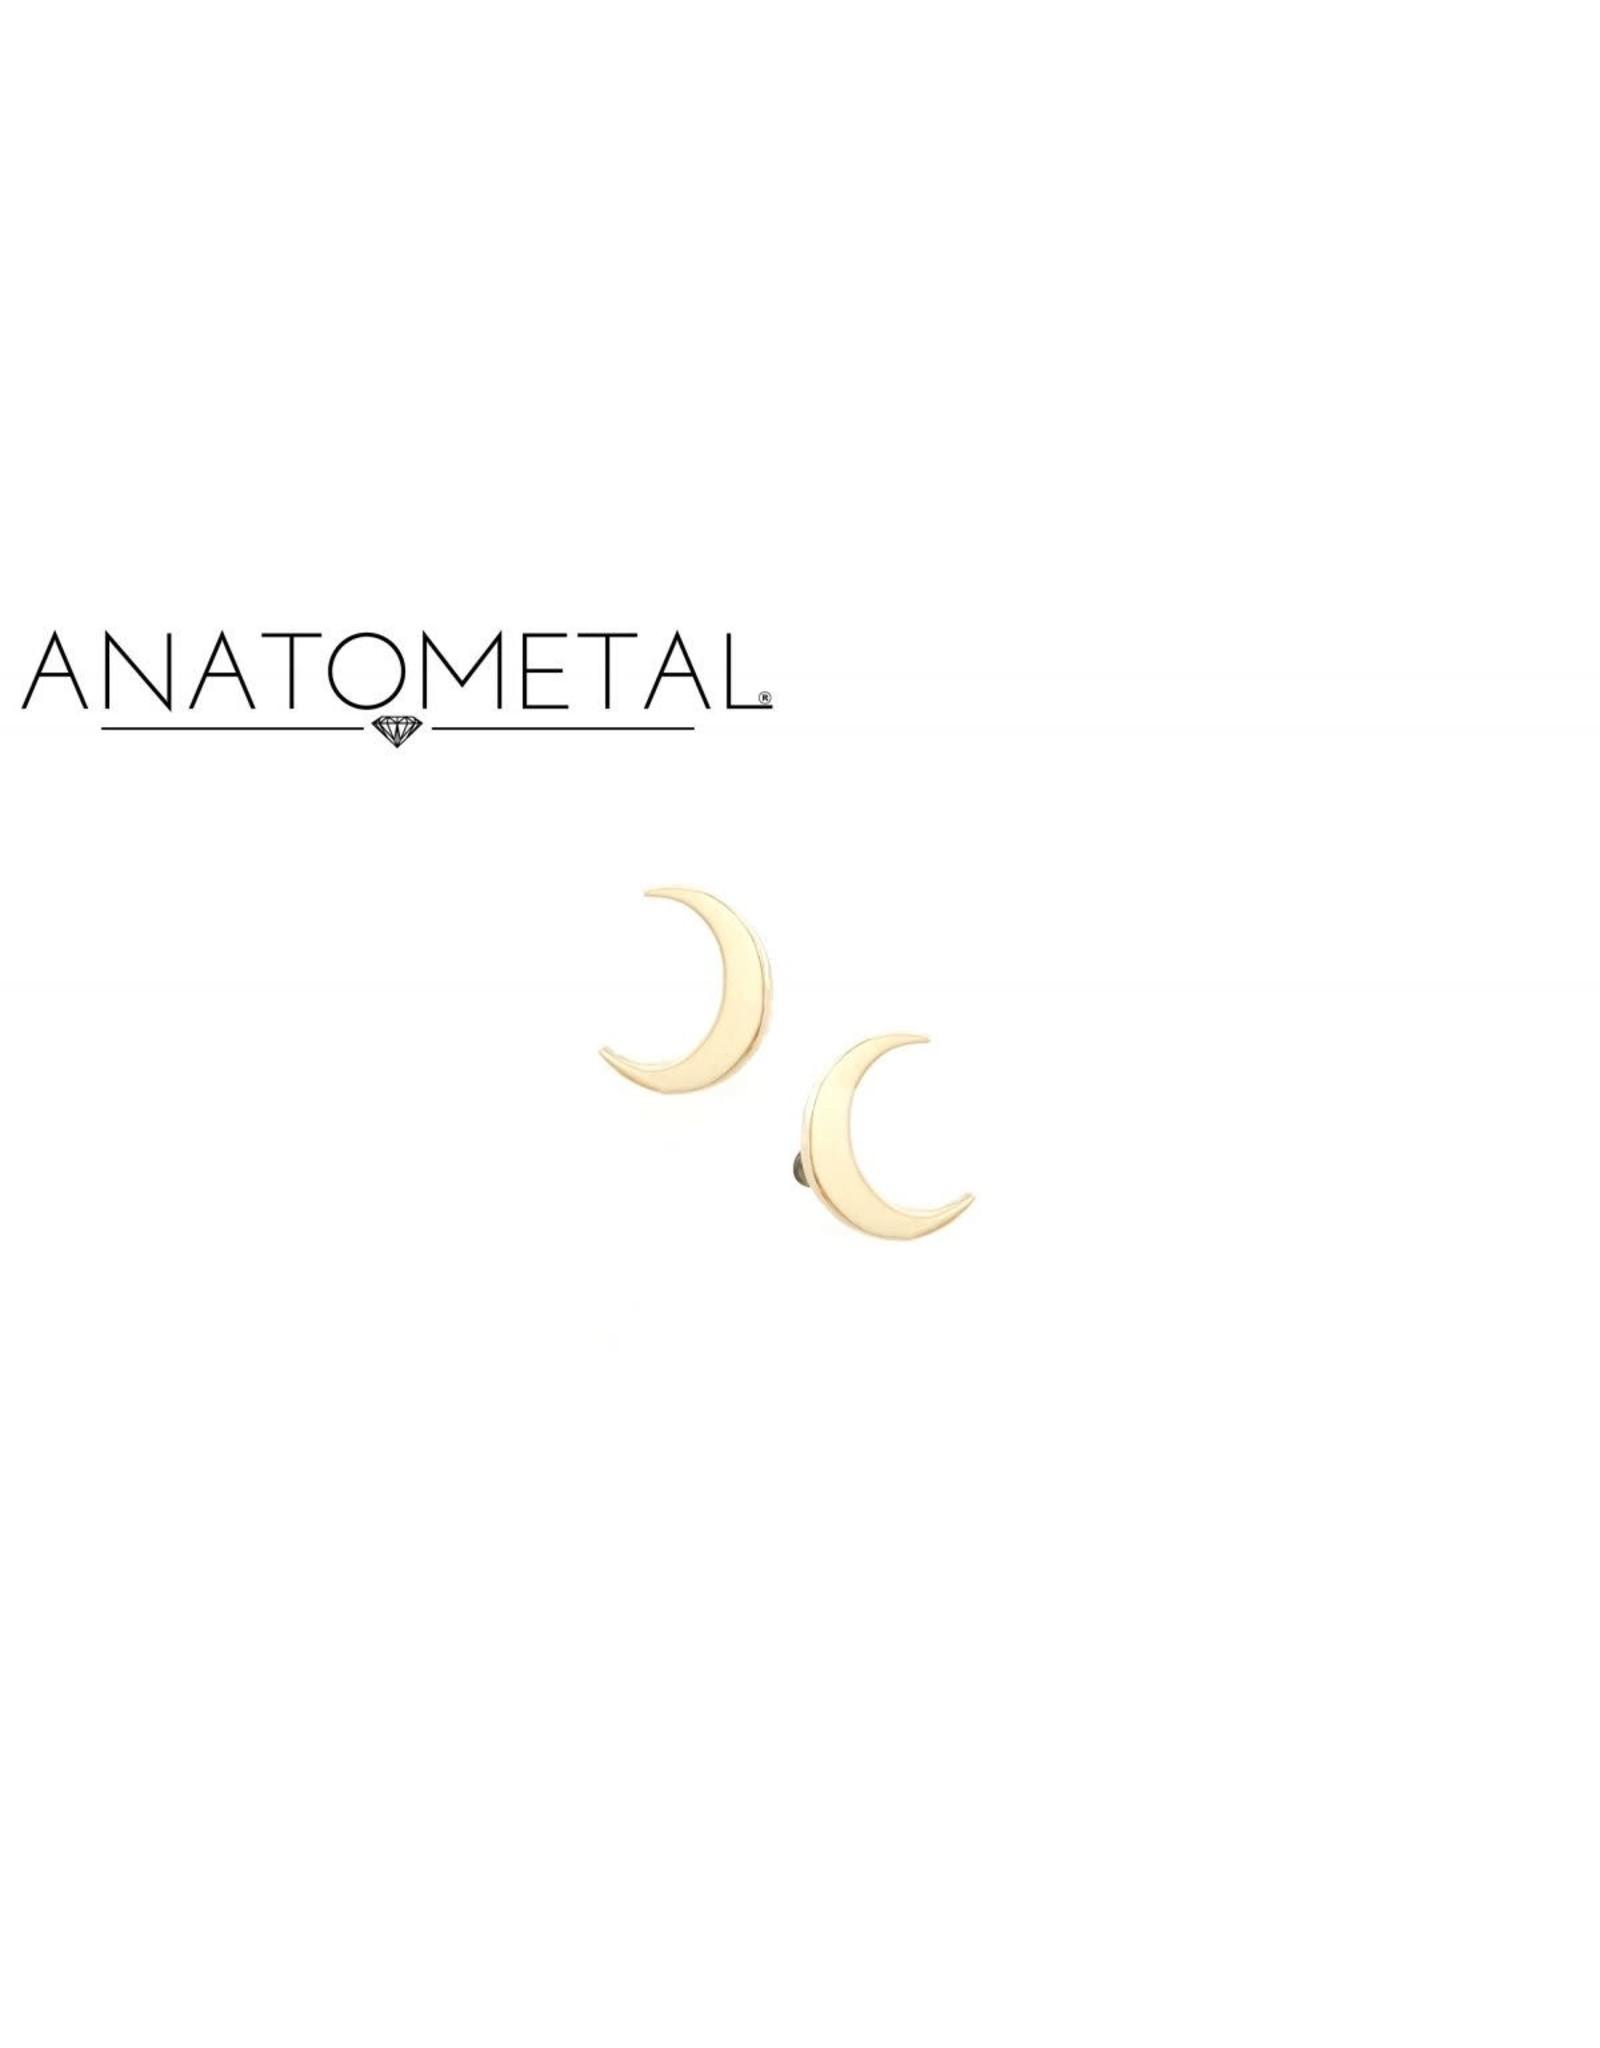 18k RG LG Crescent Moon (5mm) Threadless Pin